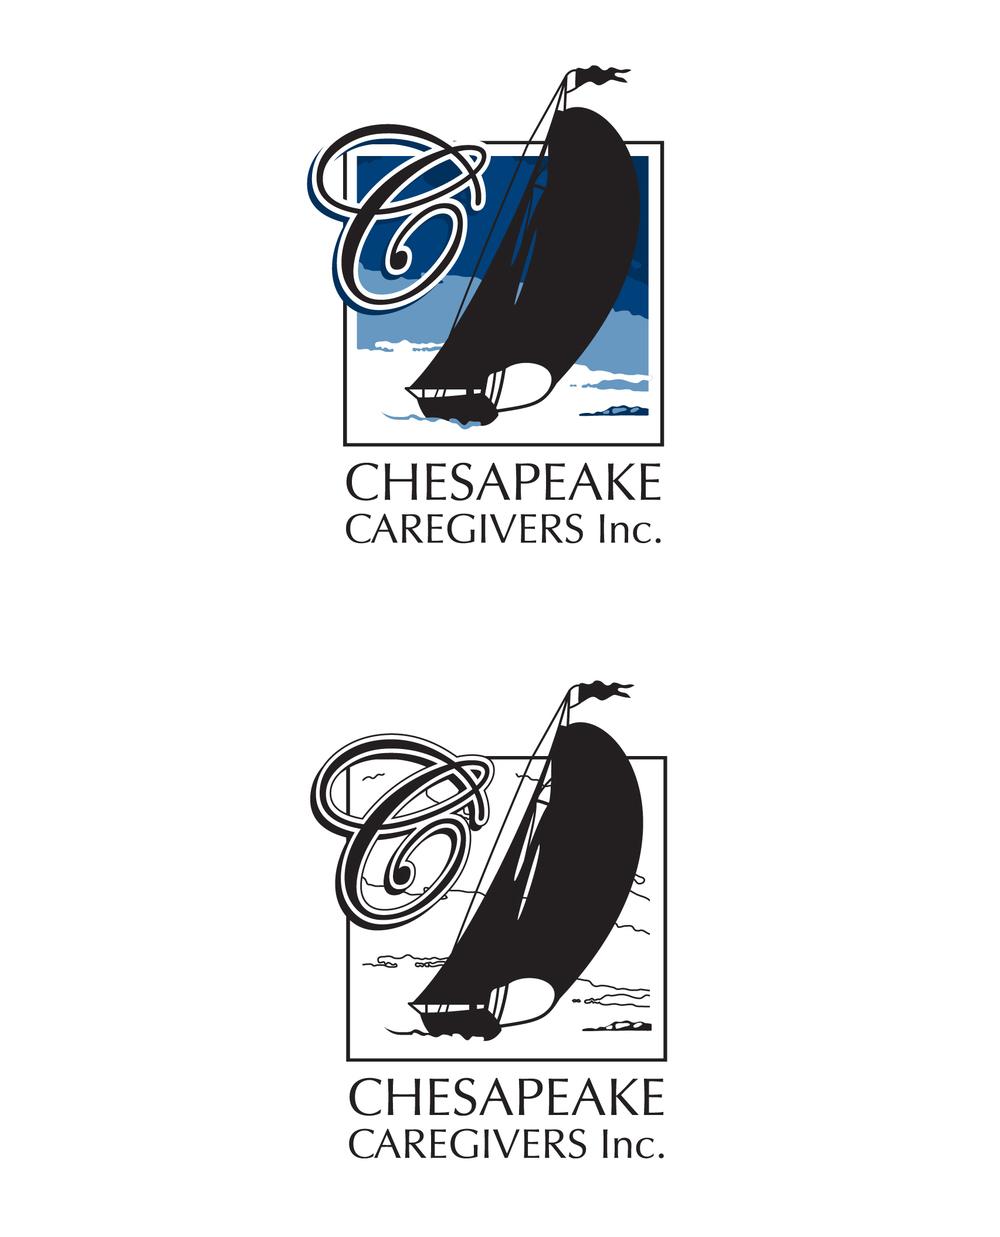 CHESAPEAKE CAREGIVERS 2.jpg